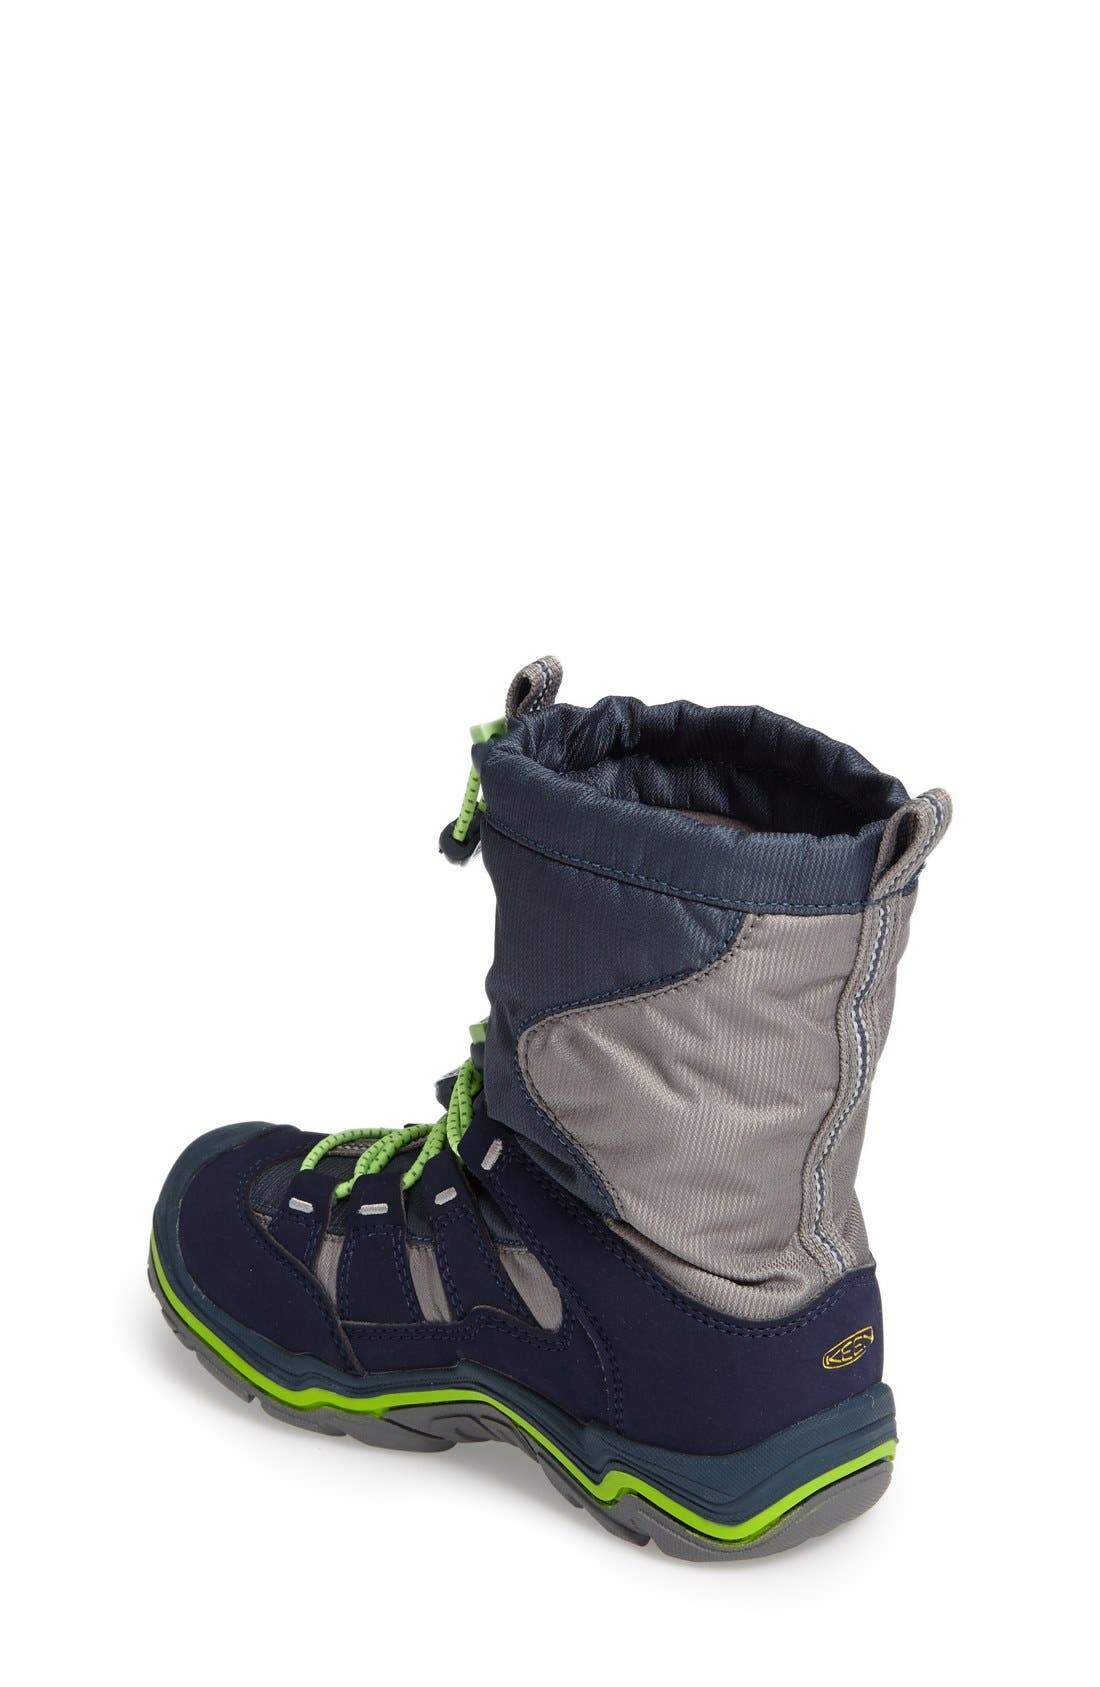 Alternate Image 2  - Keen Winterport II Waterproof Boot (Toddler, Little Kid & Big Kid)